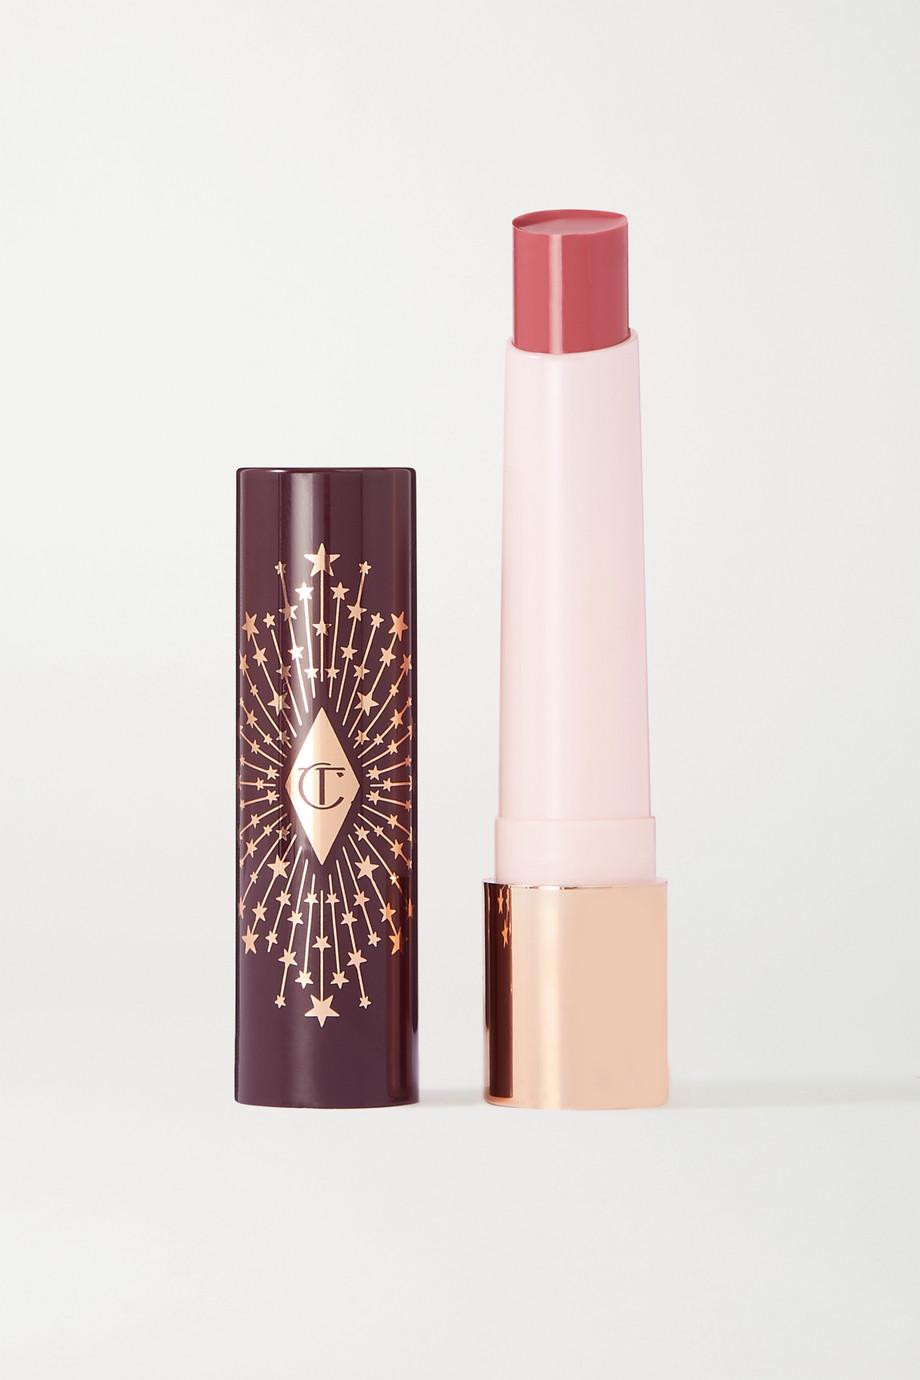 Charlotte Tilbury Hyaluronic Happikiss Lipstick Balm - Enchanting Kiss